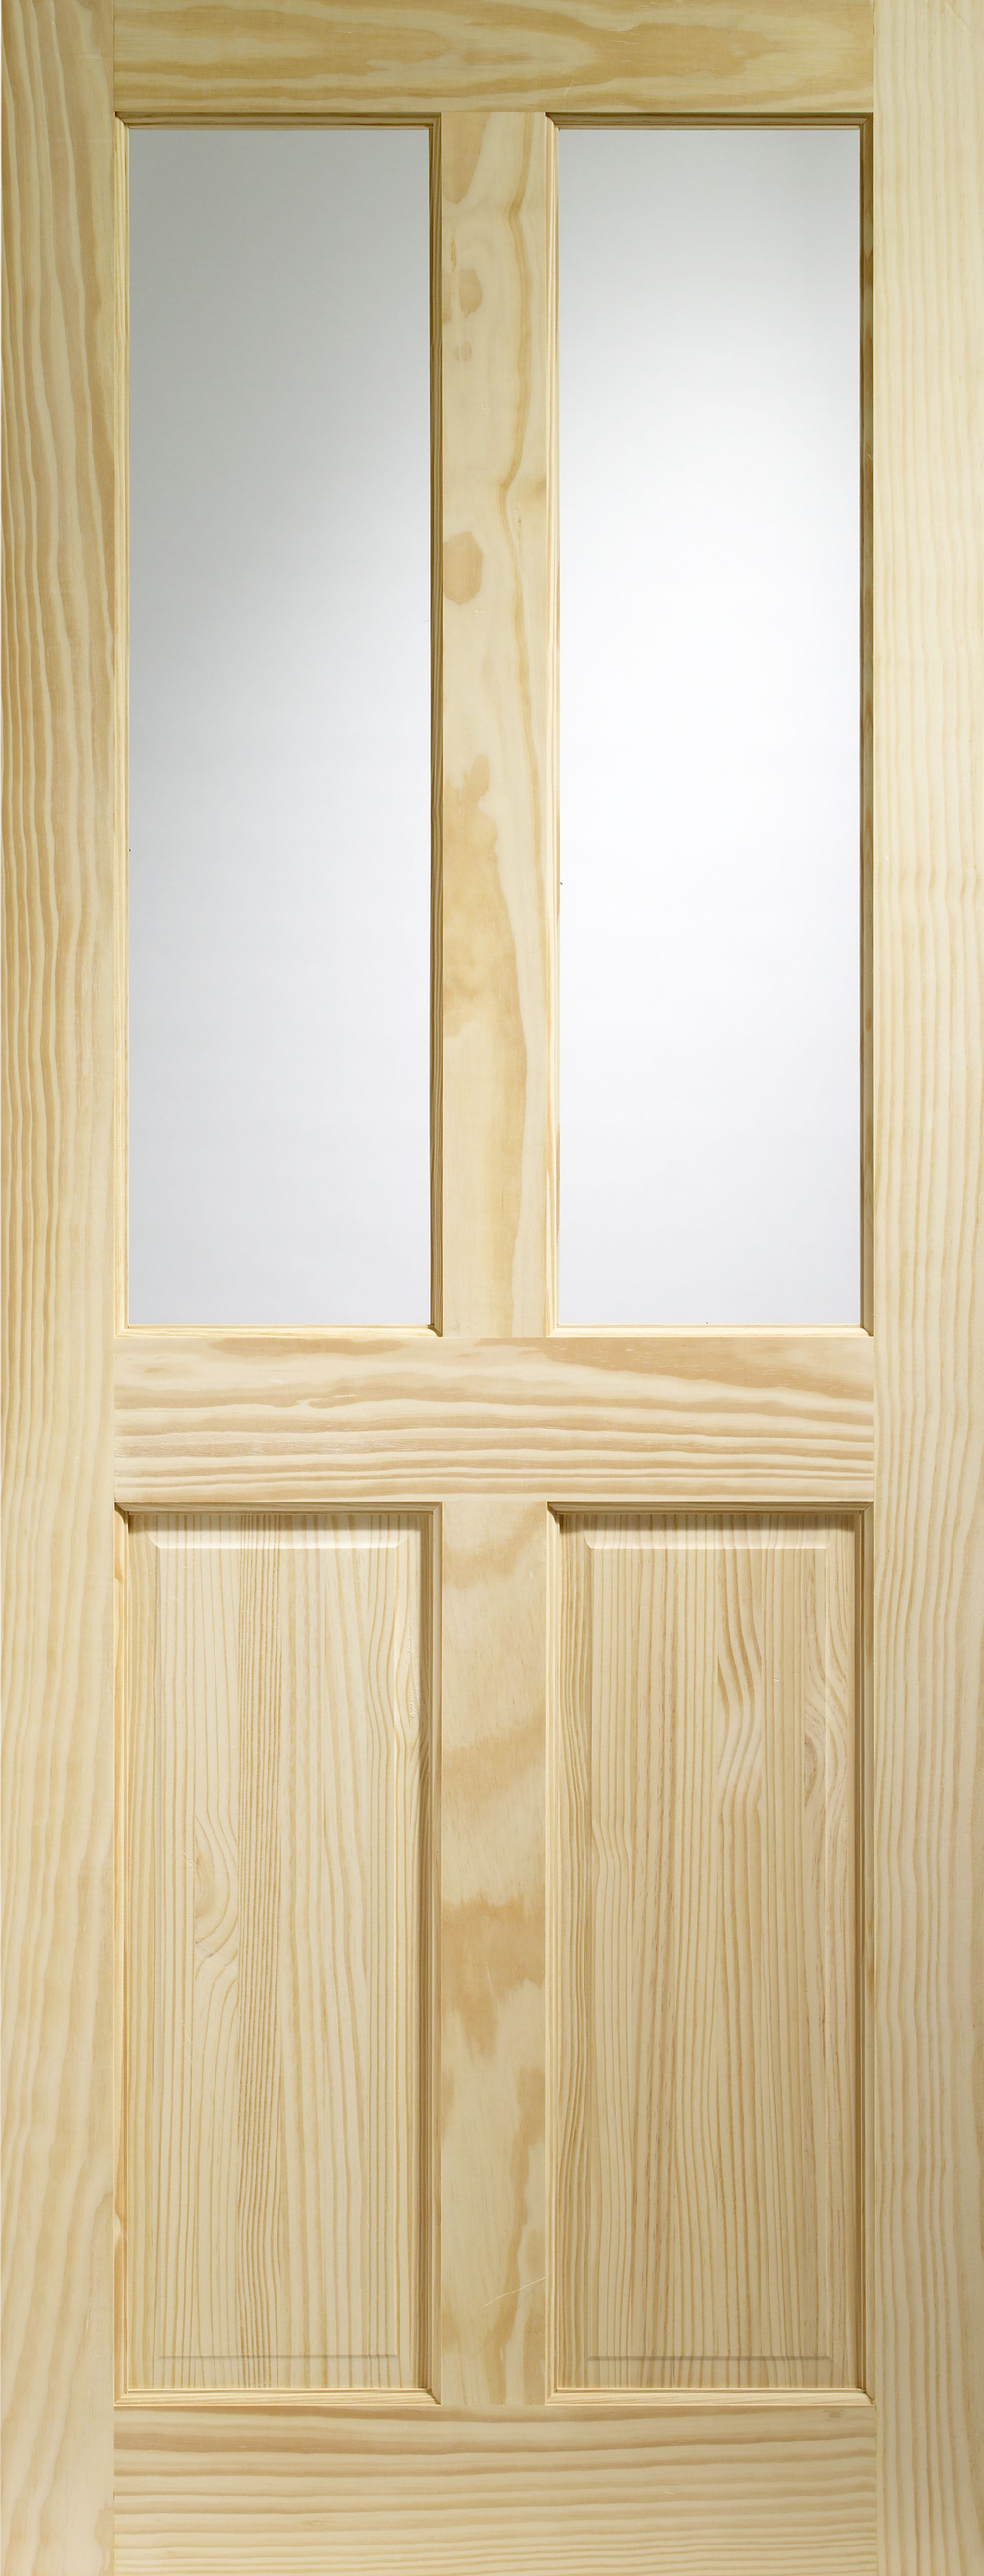 Clear Pine Victorian Clear Glass.jpg